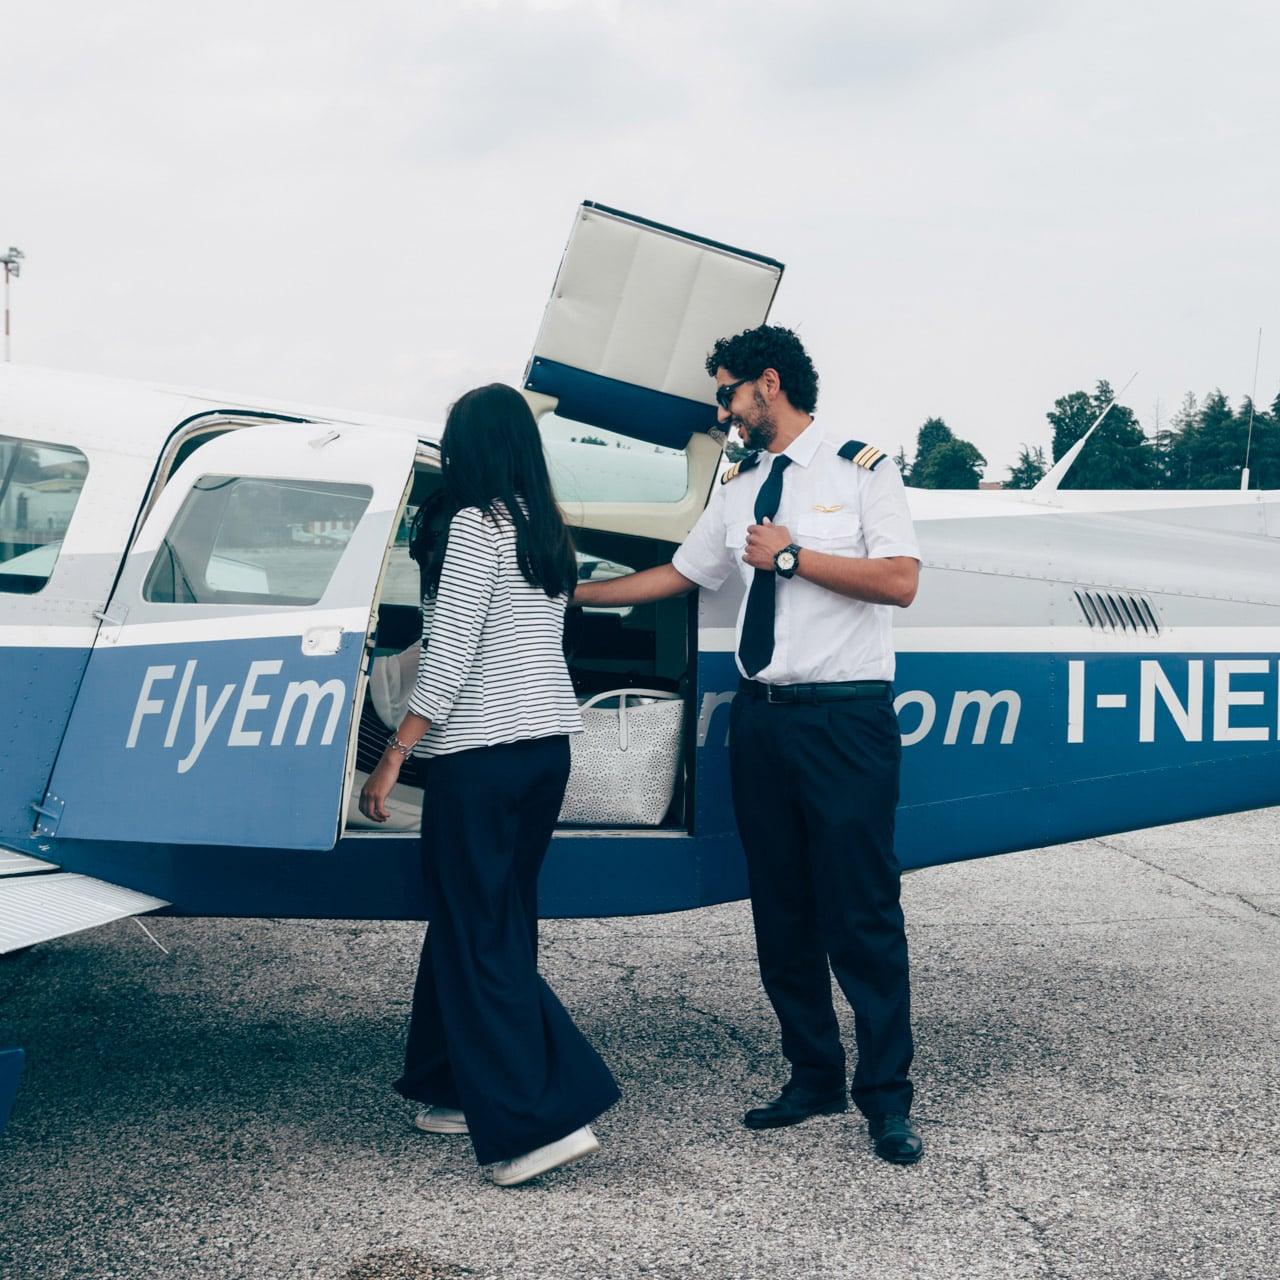 FlyEmotions-019-small-min